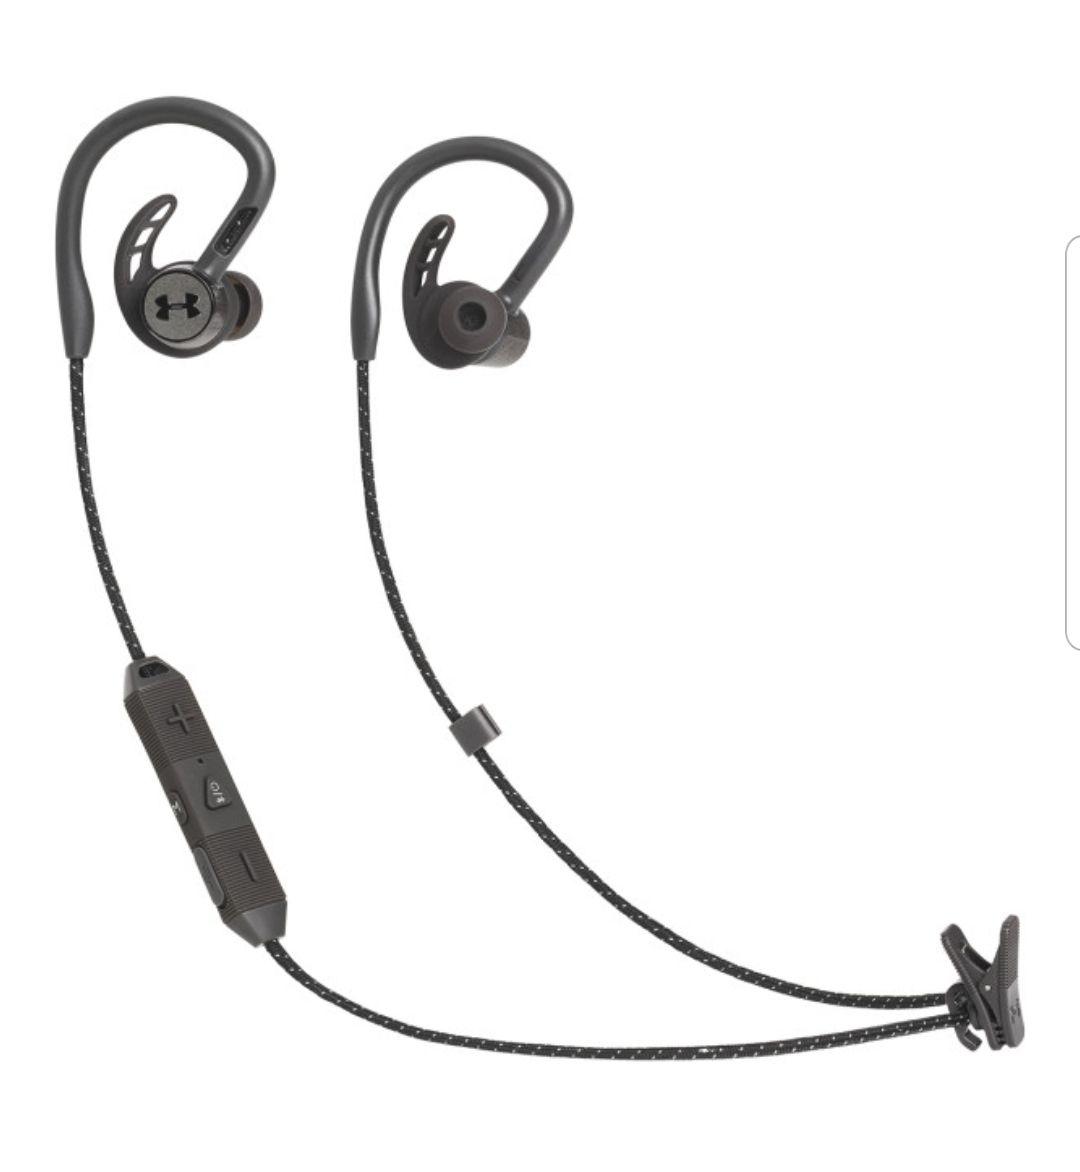 JBL | Under Armour | BT Kopfhörer | Wireless Pivot | Sport Ohrhörer | [Ebay Medimax-Nettetal]